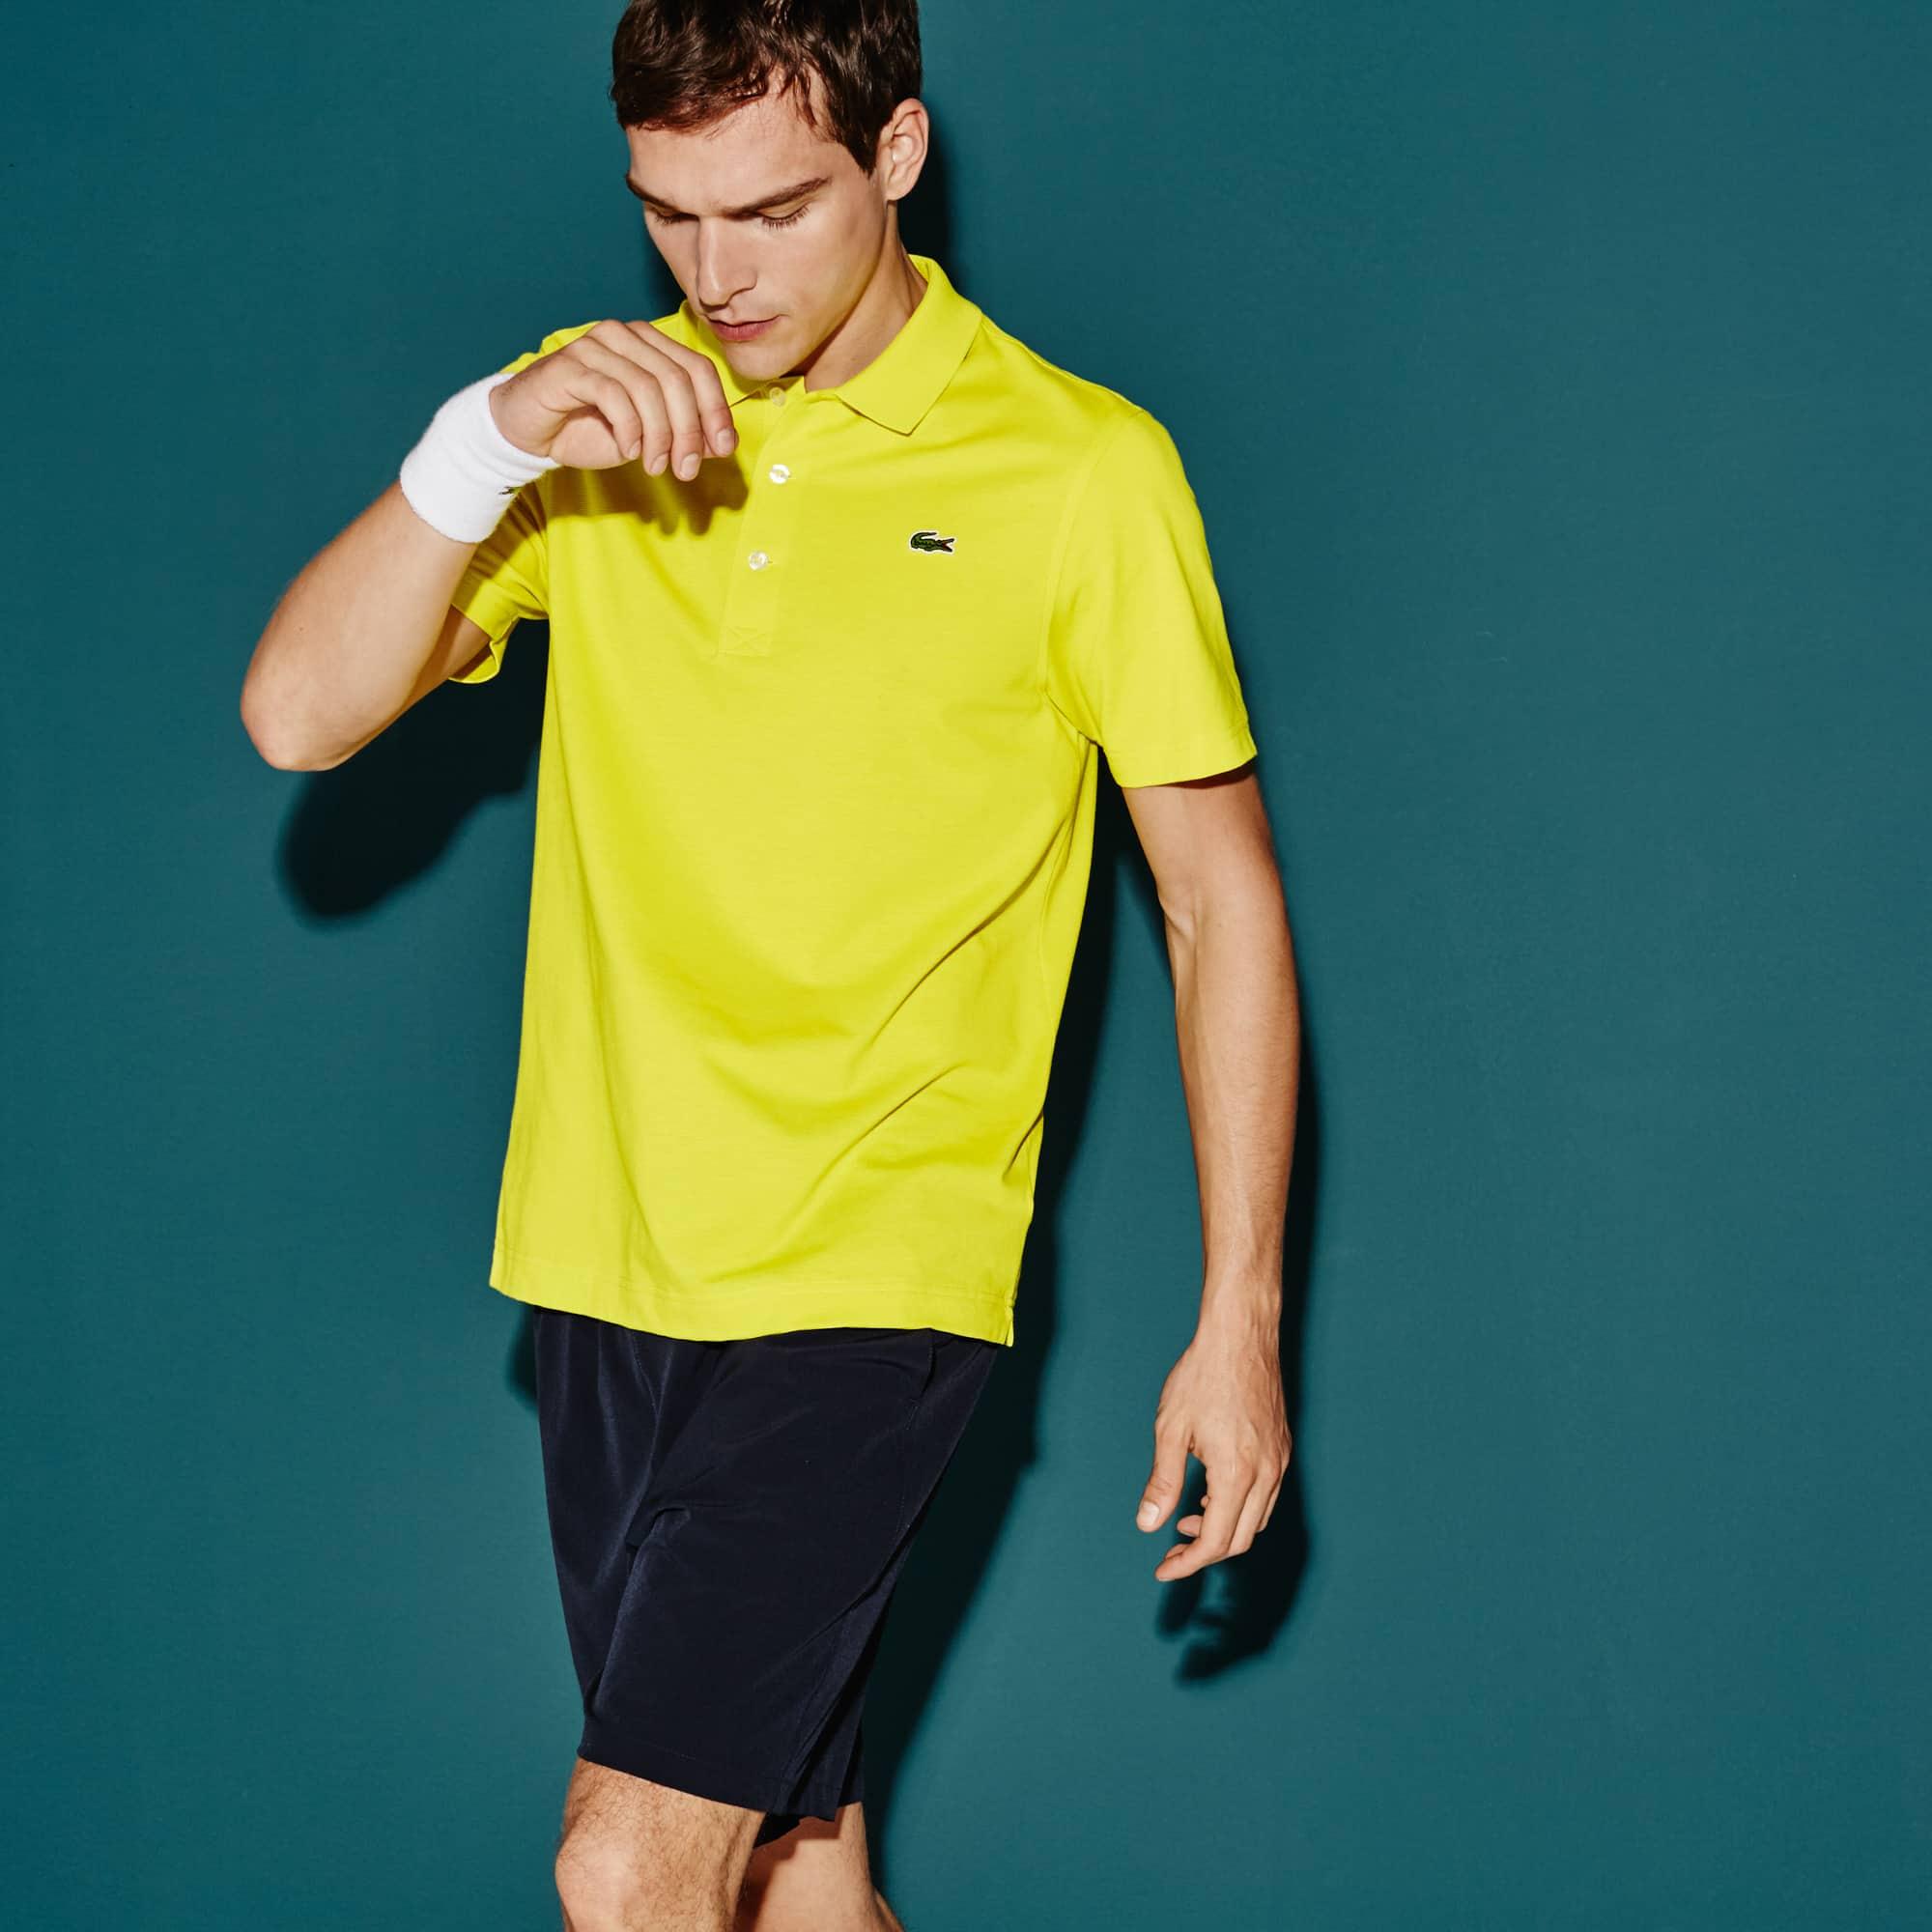 Polo Lacoste SPORT Tennis Regular Fit Masculina em Malha Superleve